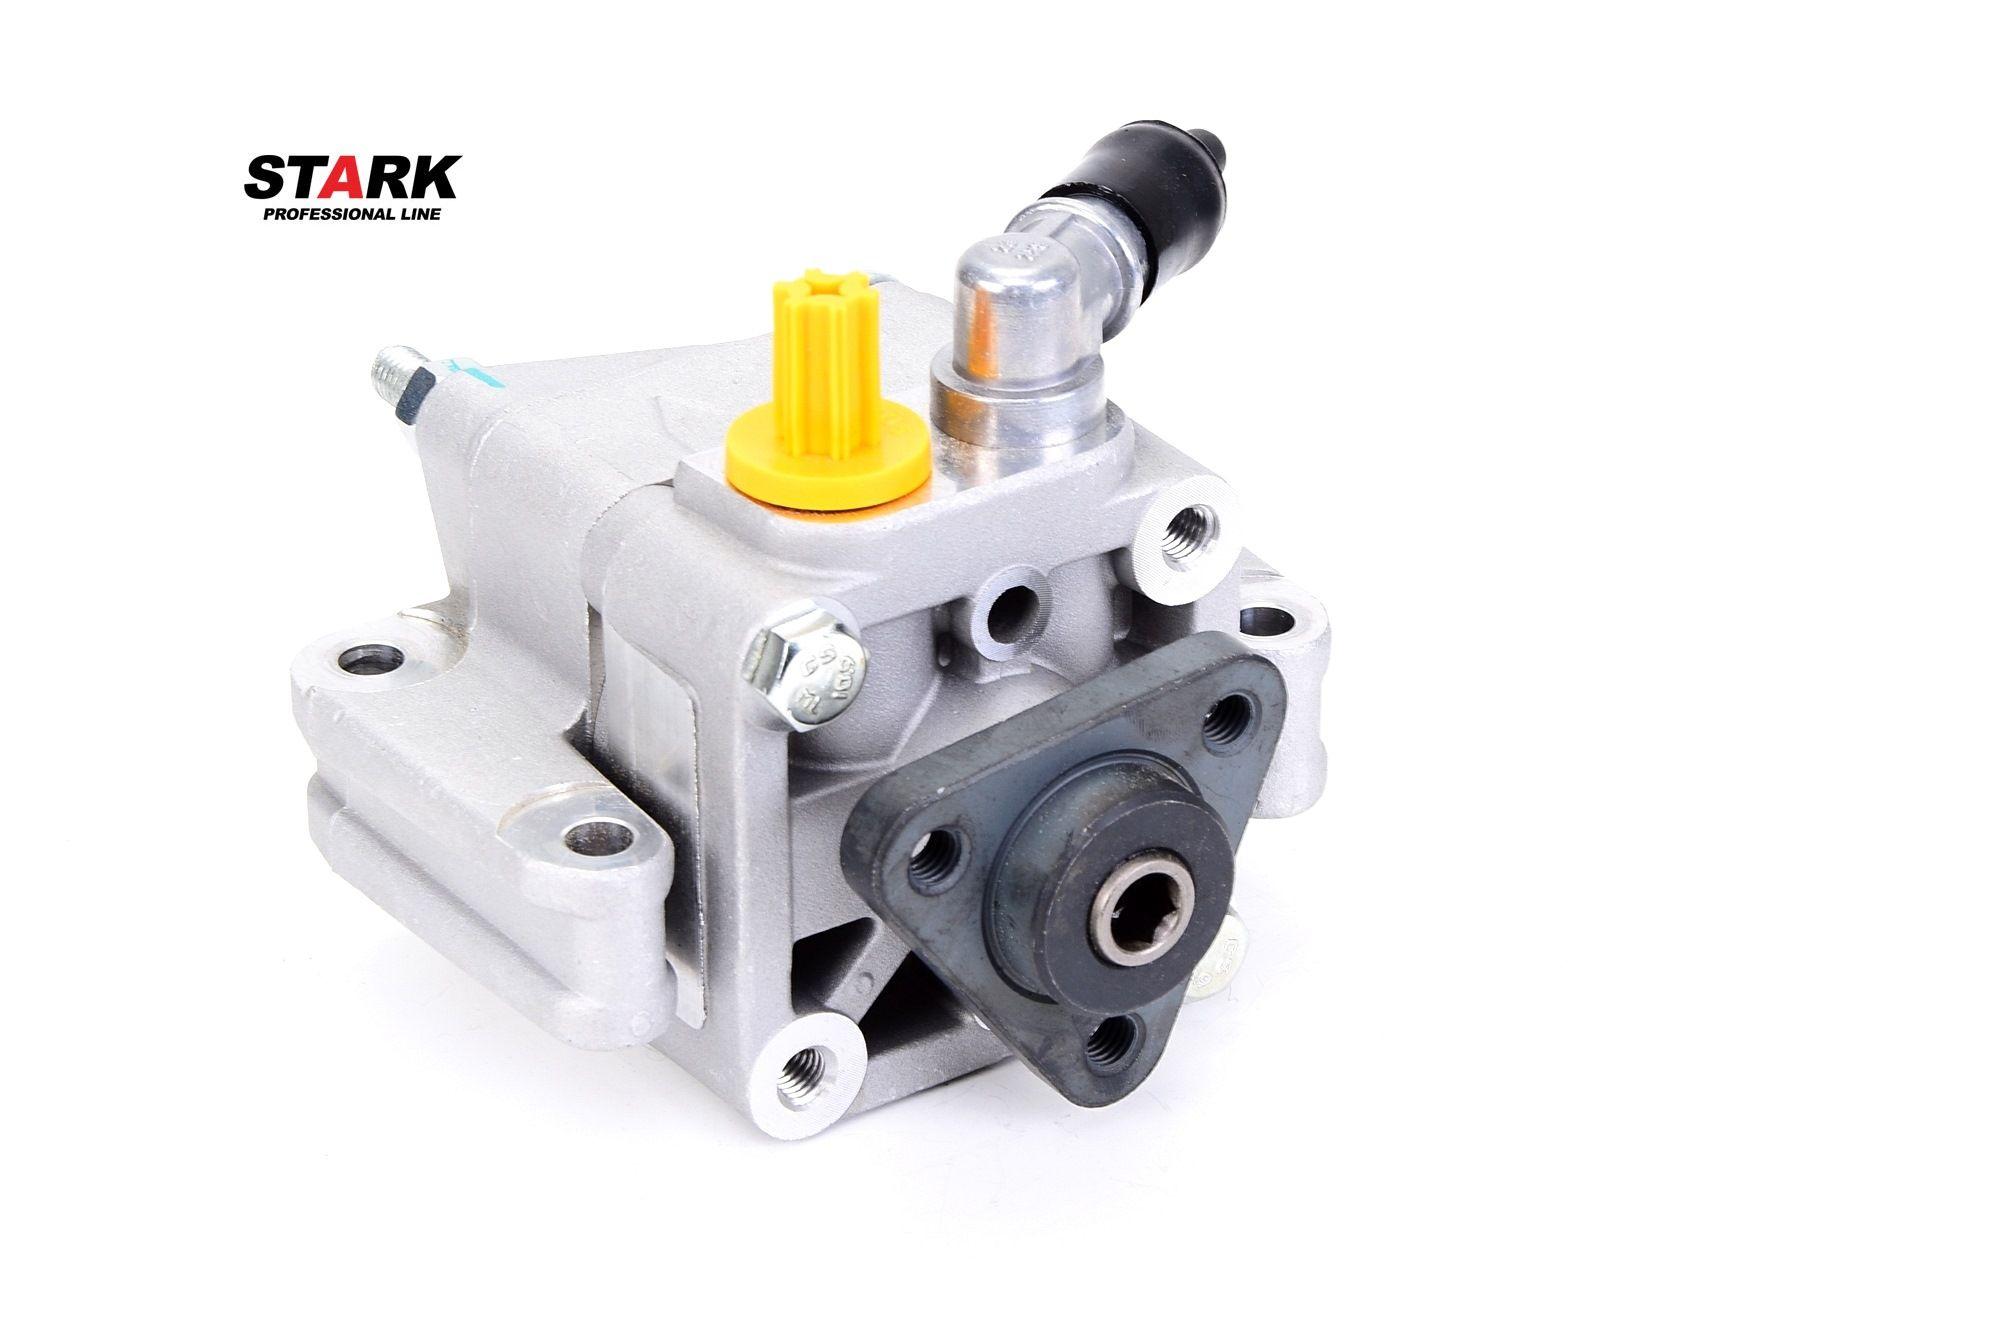 STARK: Original Elektrische Servopumpe SKHP-0540029 (Links-/Rechtslenker: für Links-/Rechtslenker)